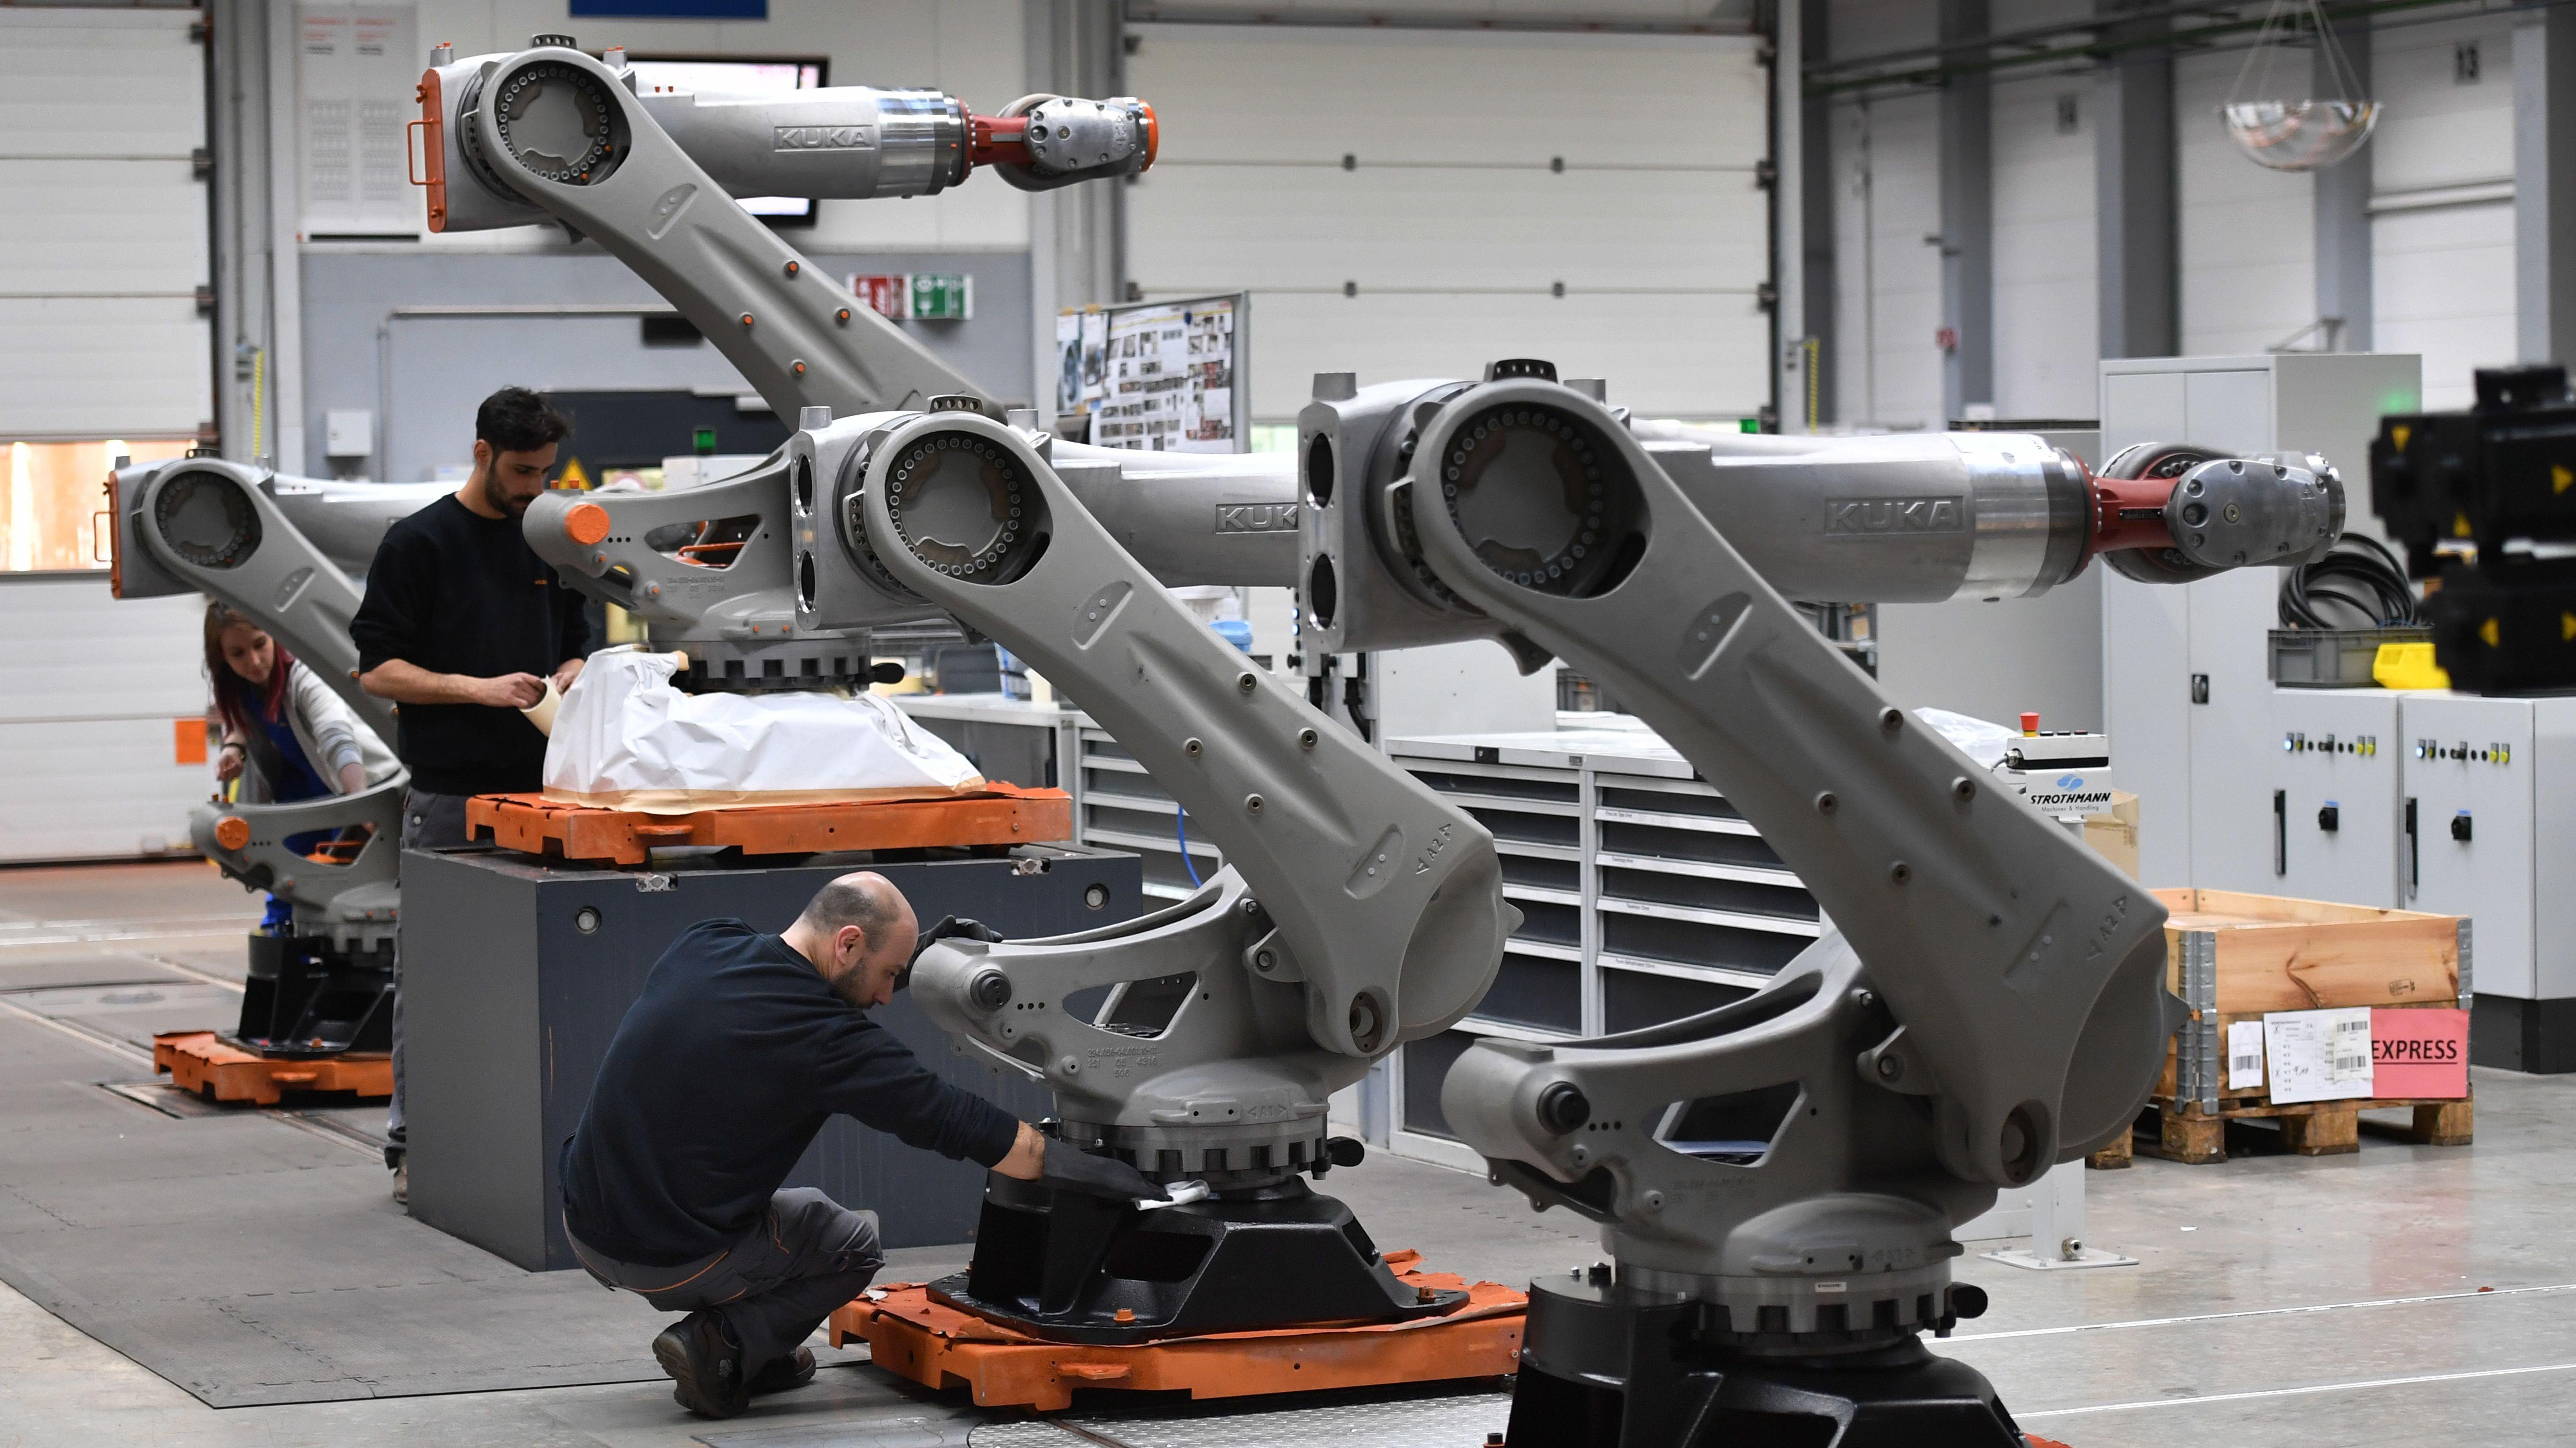 Roboter Produktion-Fertigung, Industrieroboter werden zusammengebaut.